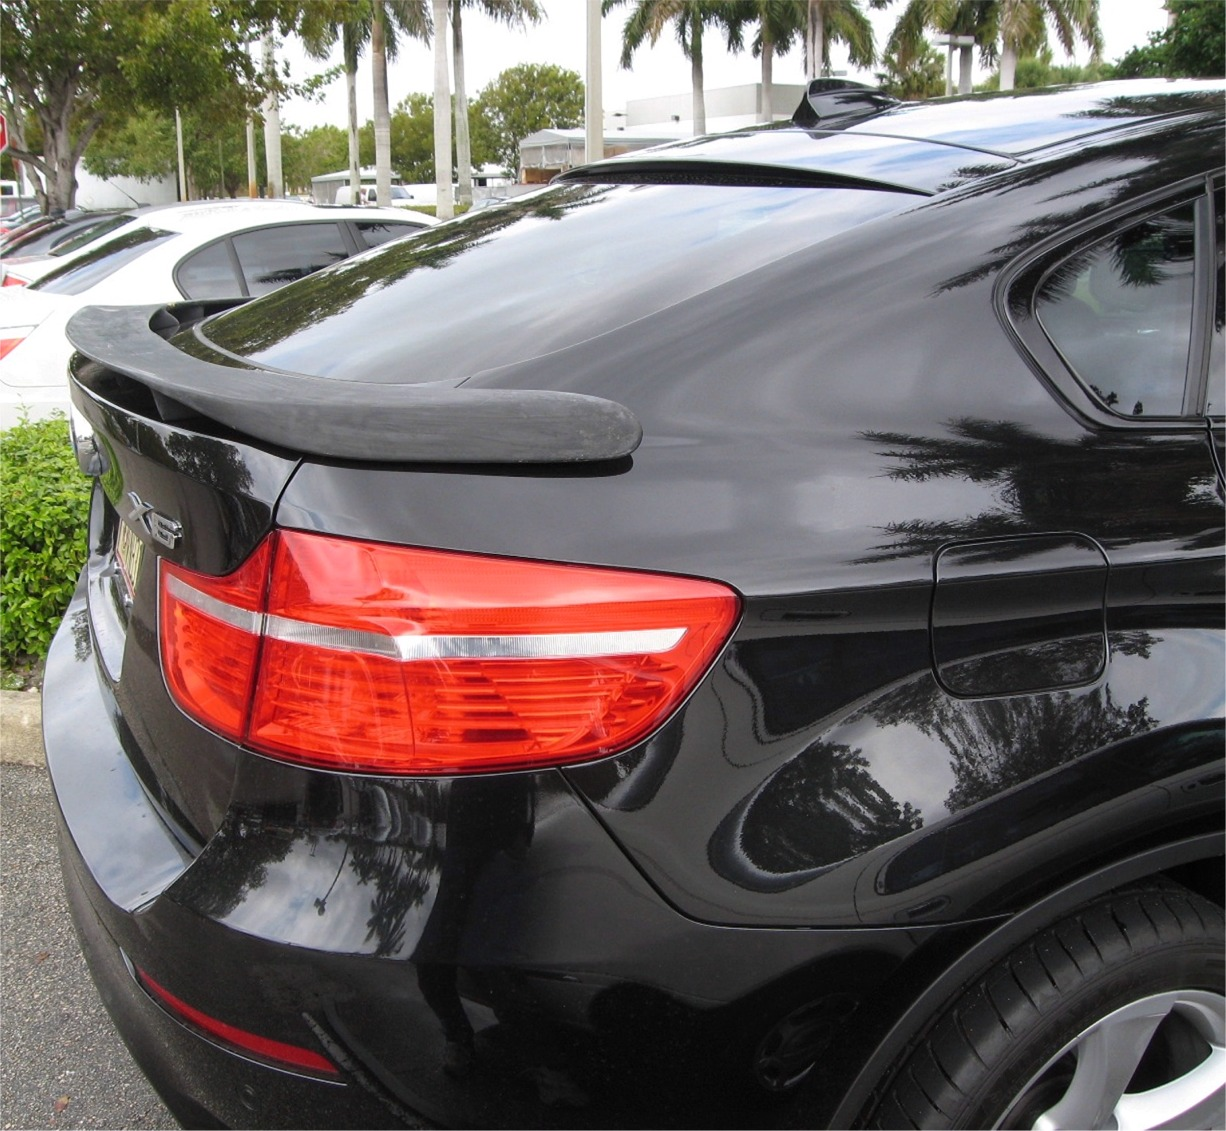 Bmw X6 Sale: 2008-2013 BMW X6 H-Style 3 Post Rear Wing Spoiler